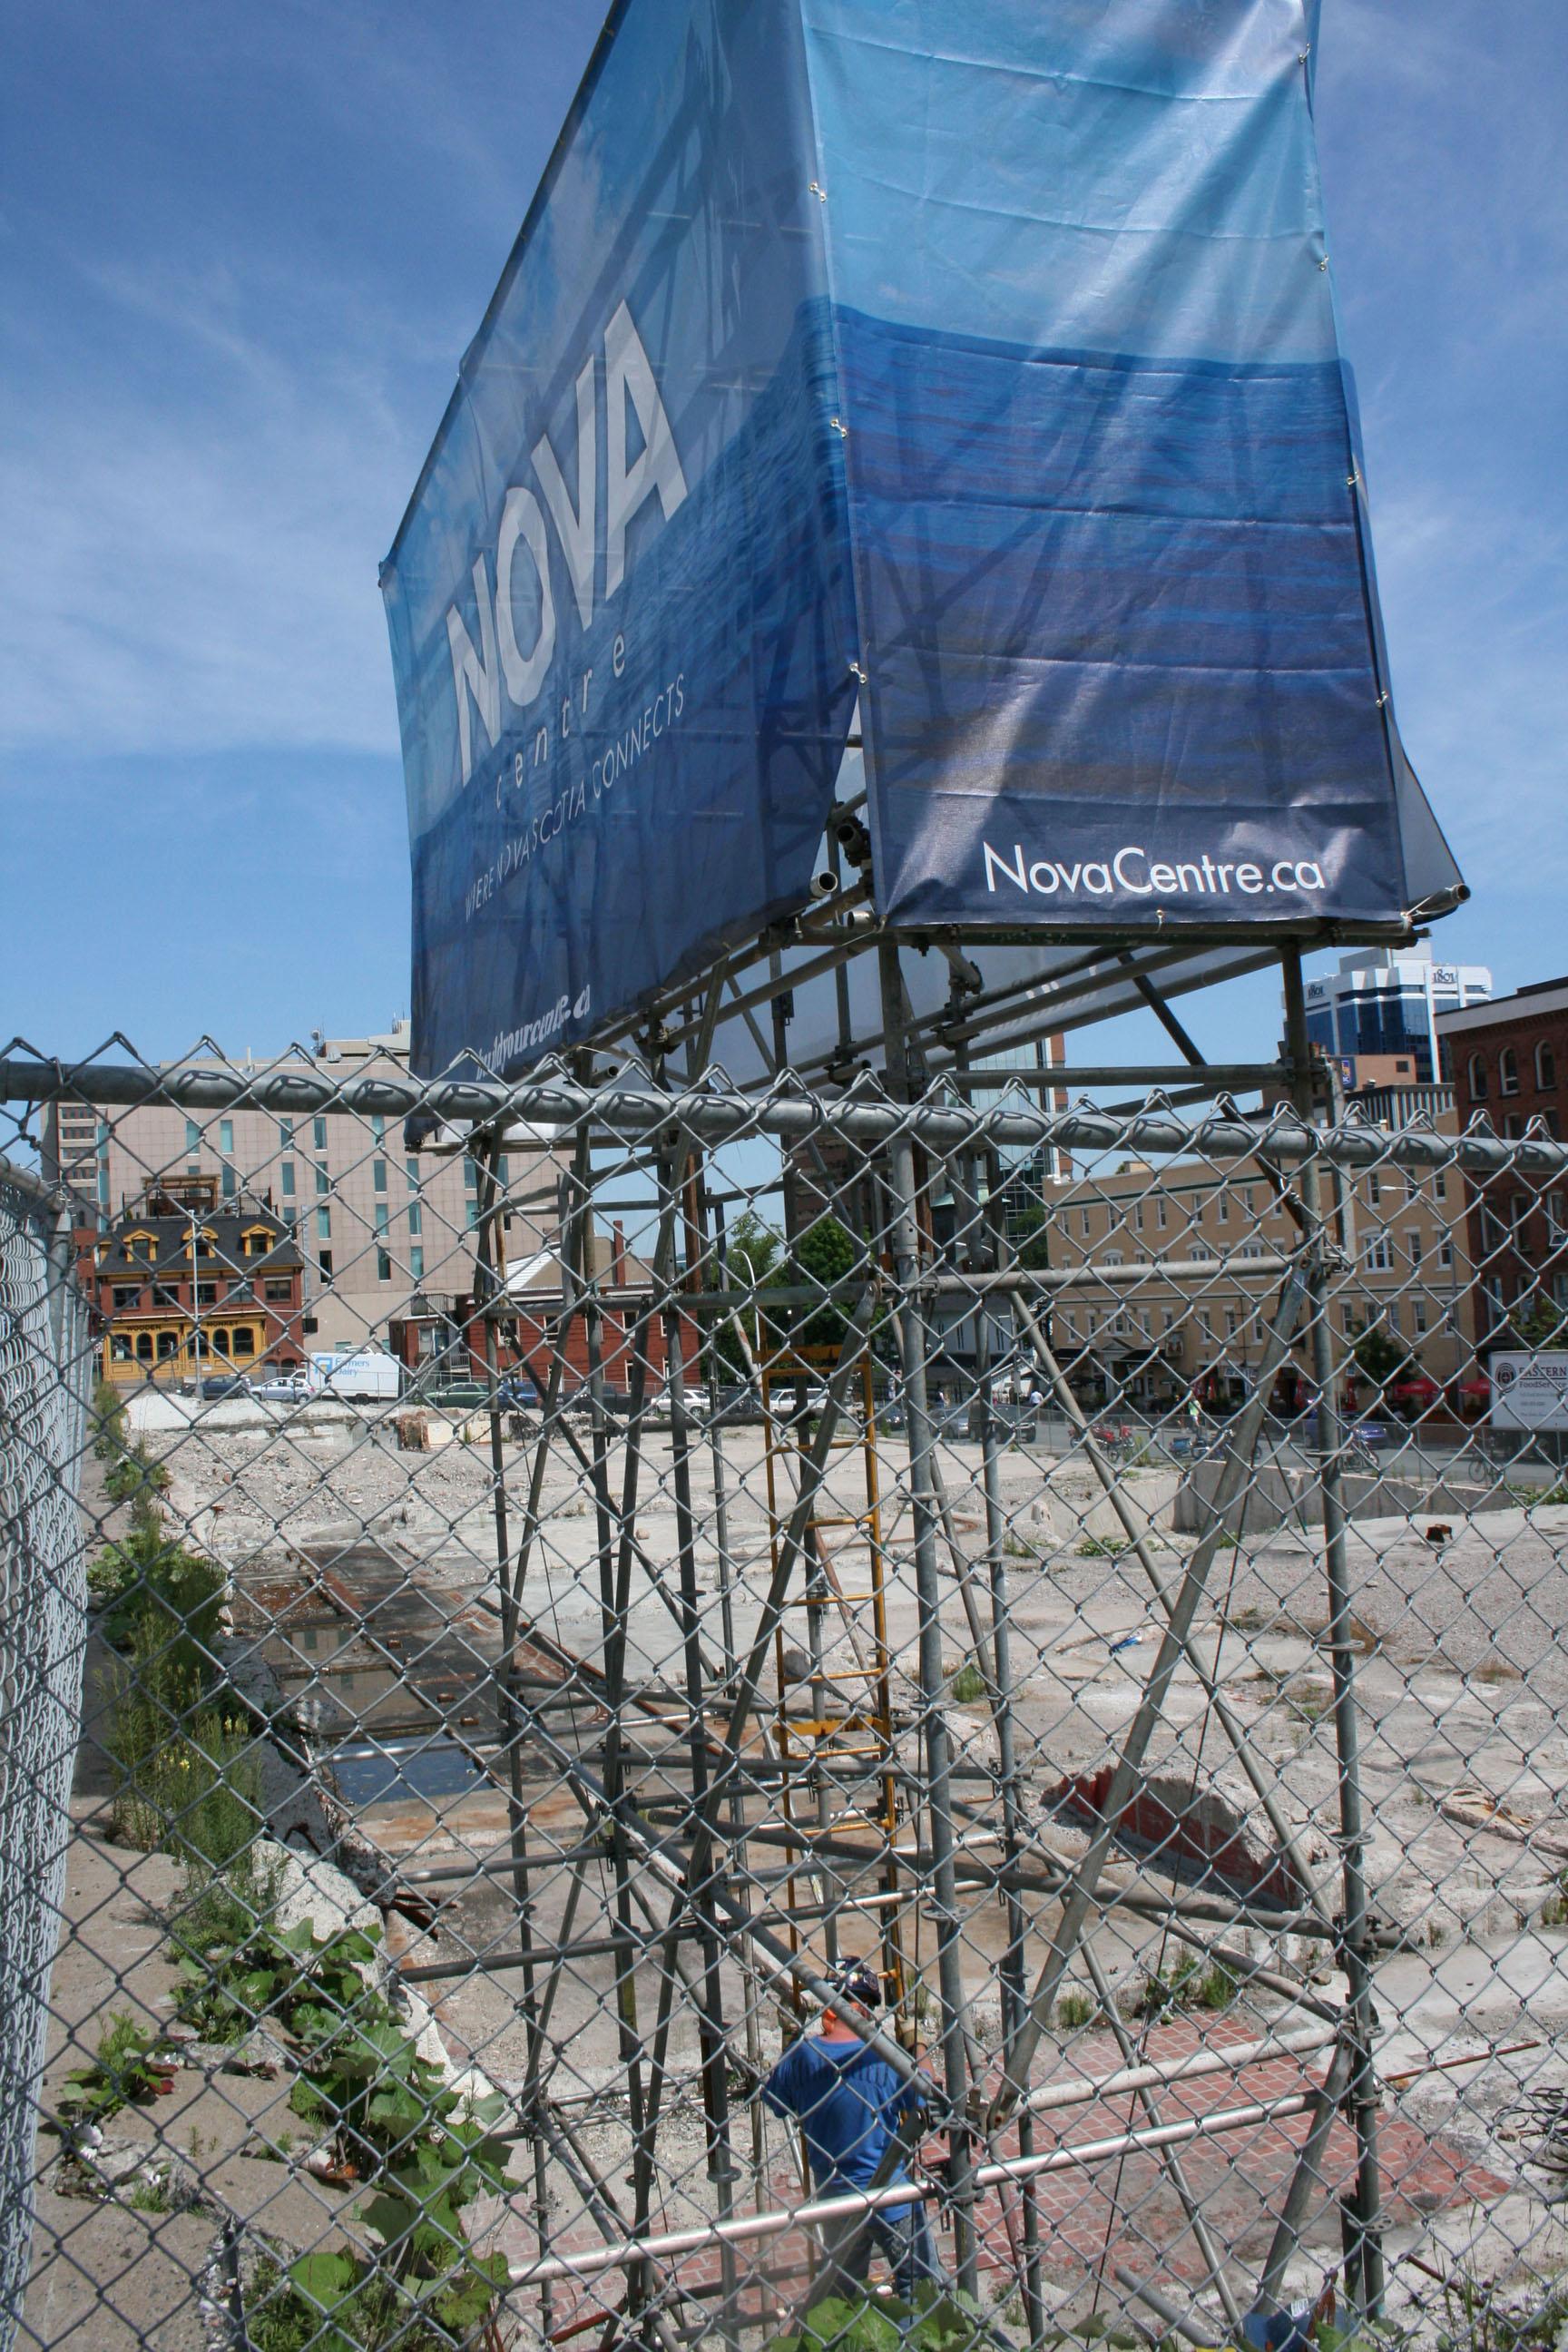 The future site of the Nova Center.